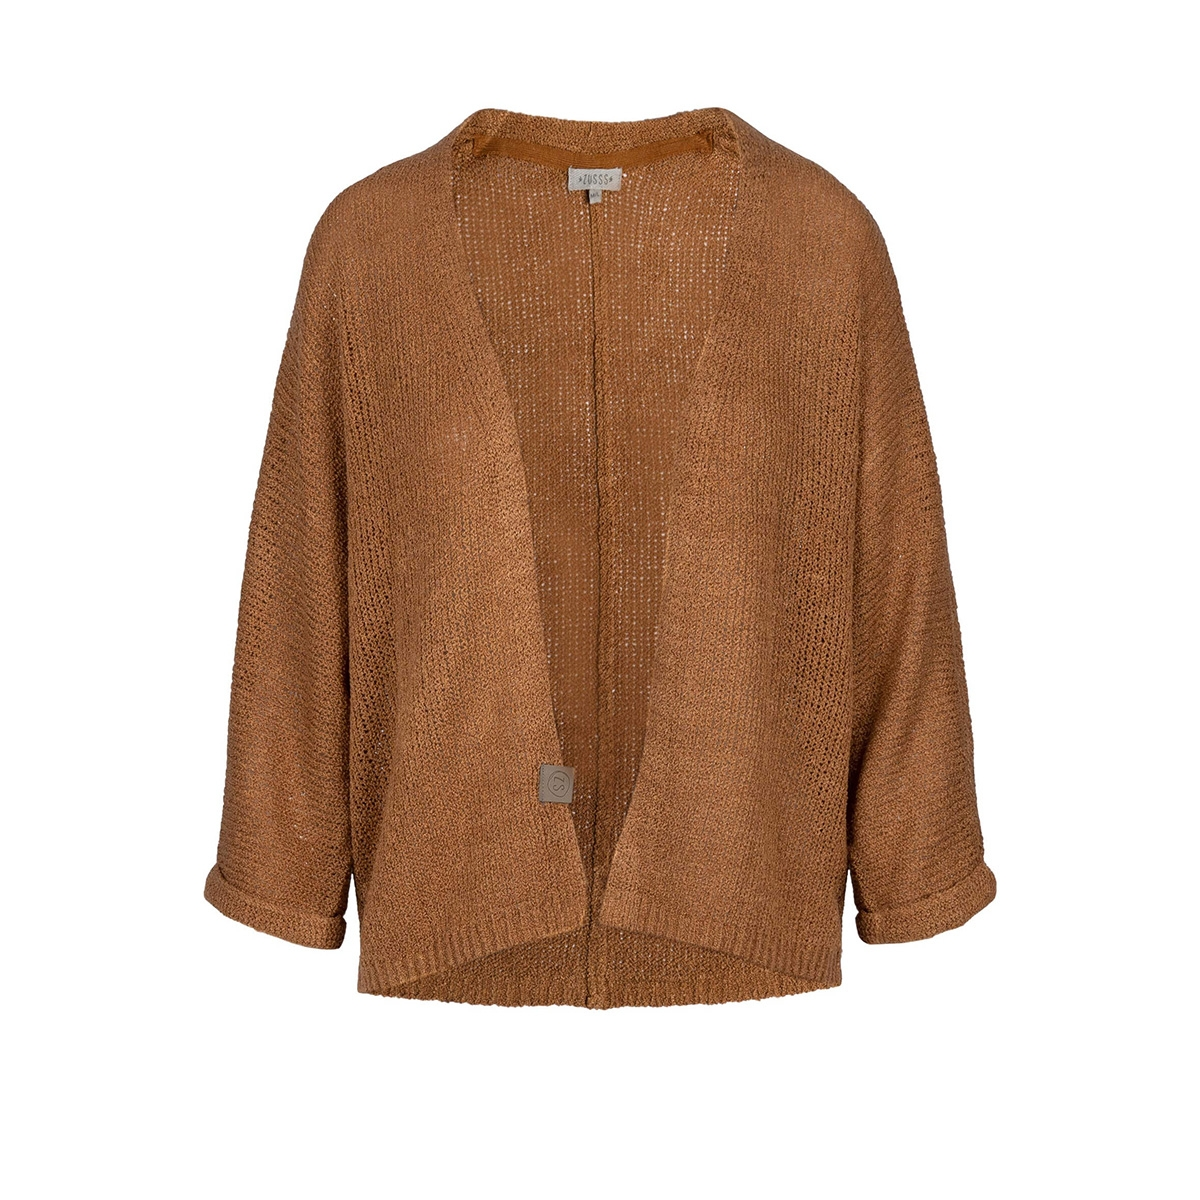 nonchalant vestje 0306 012 6506 zusss vest honing